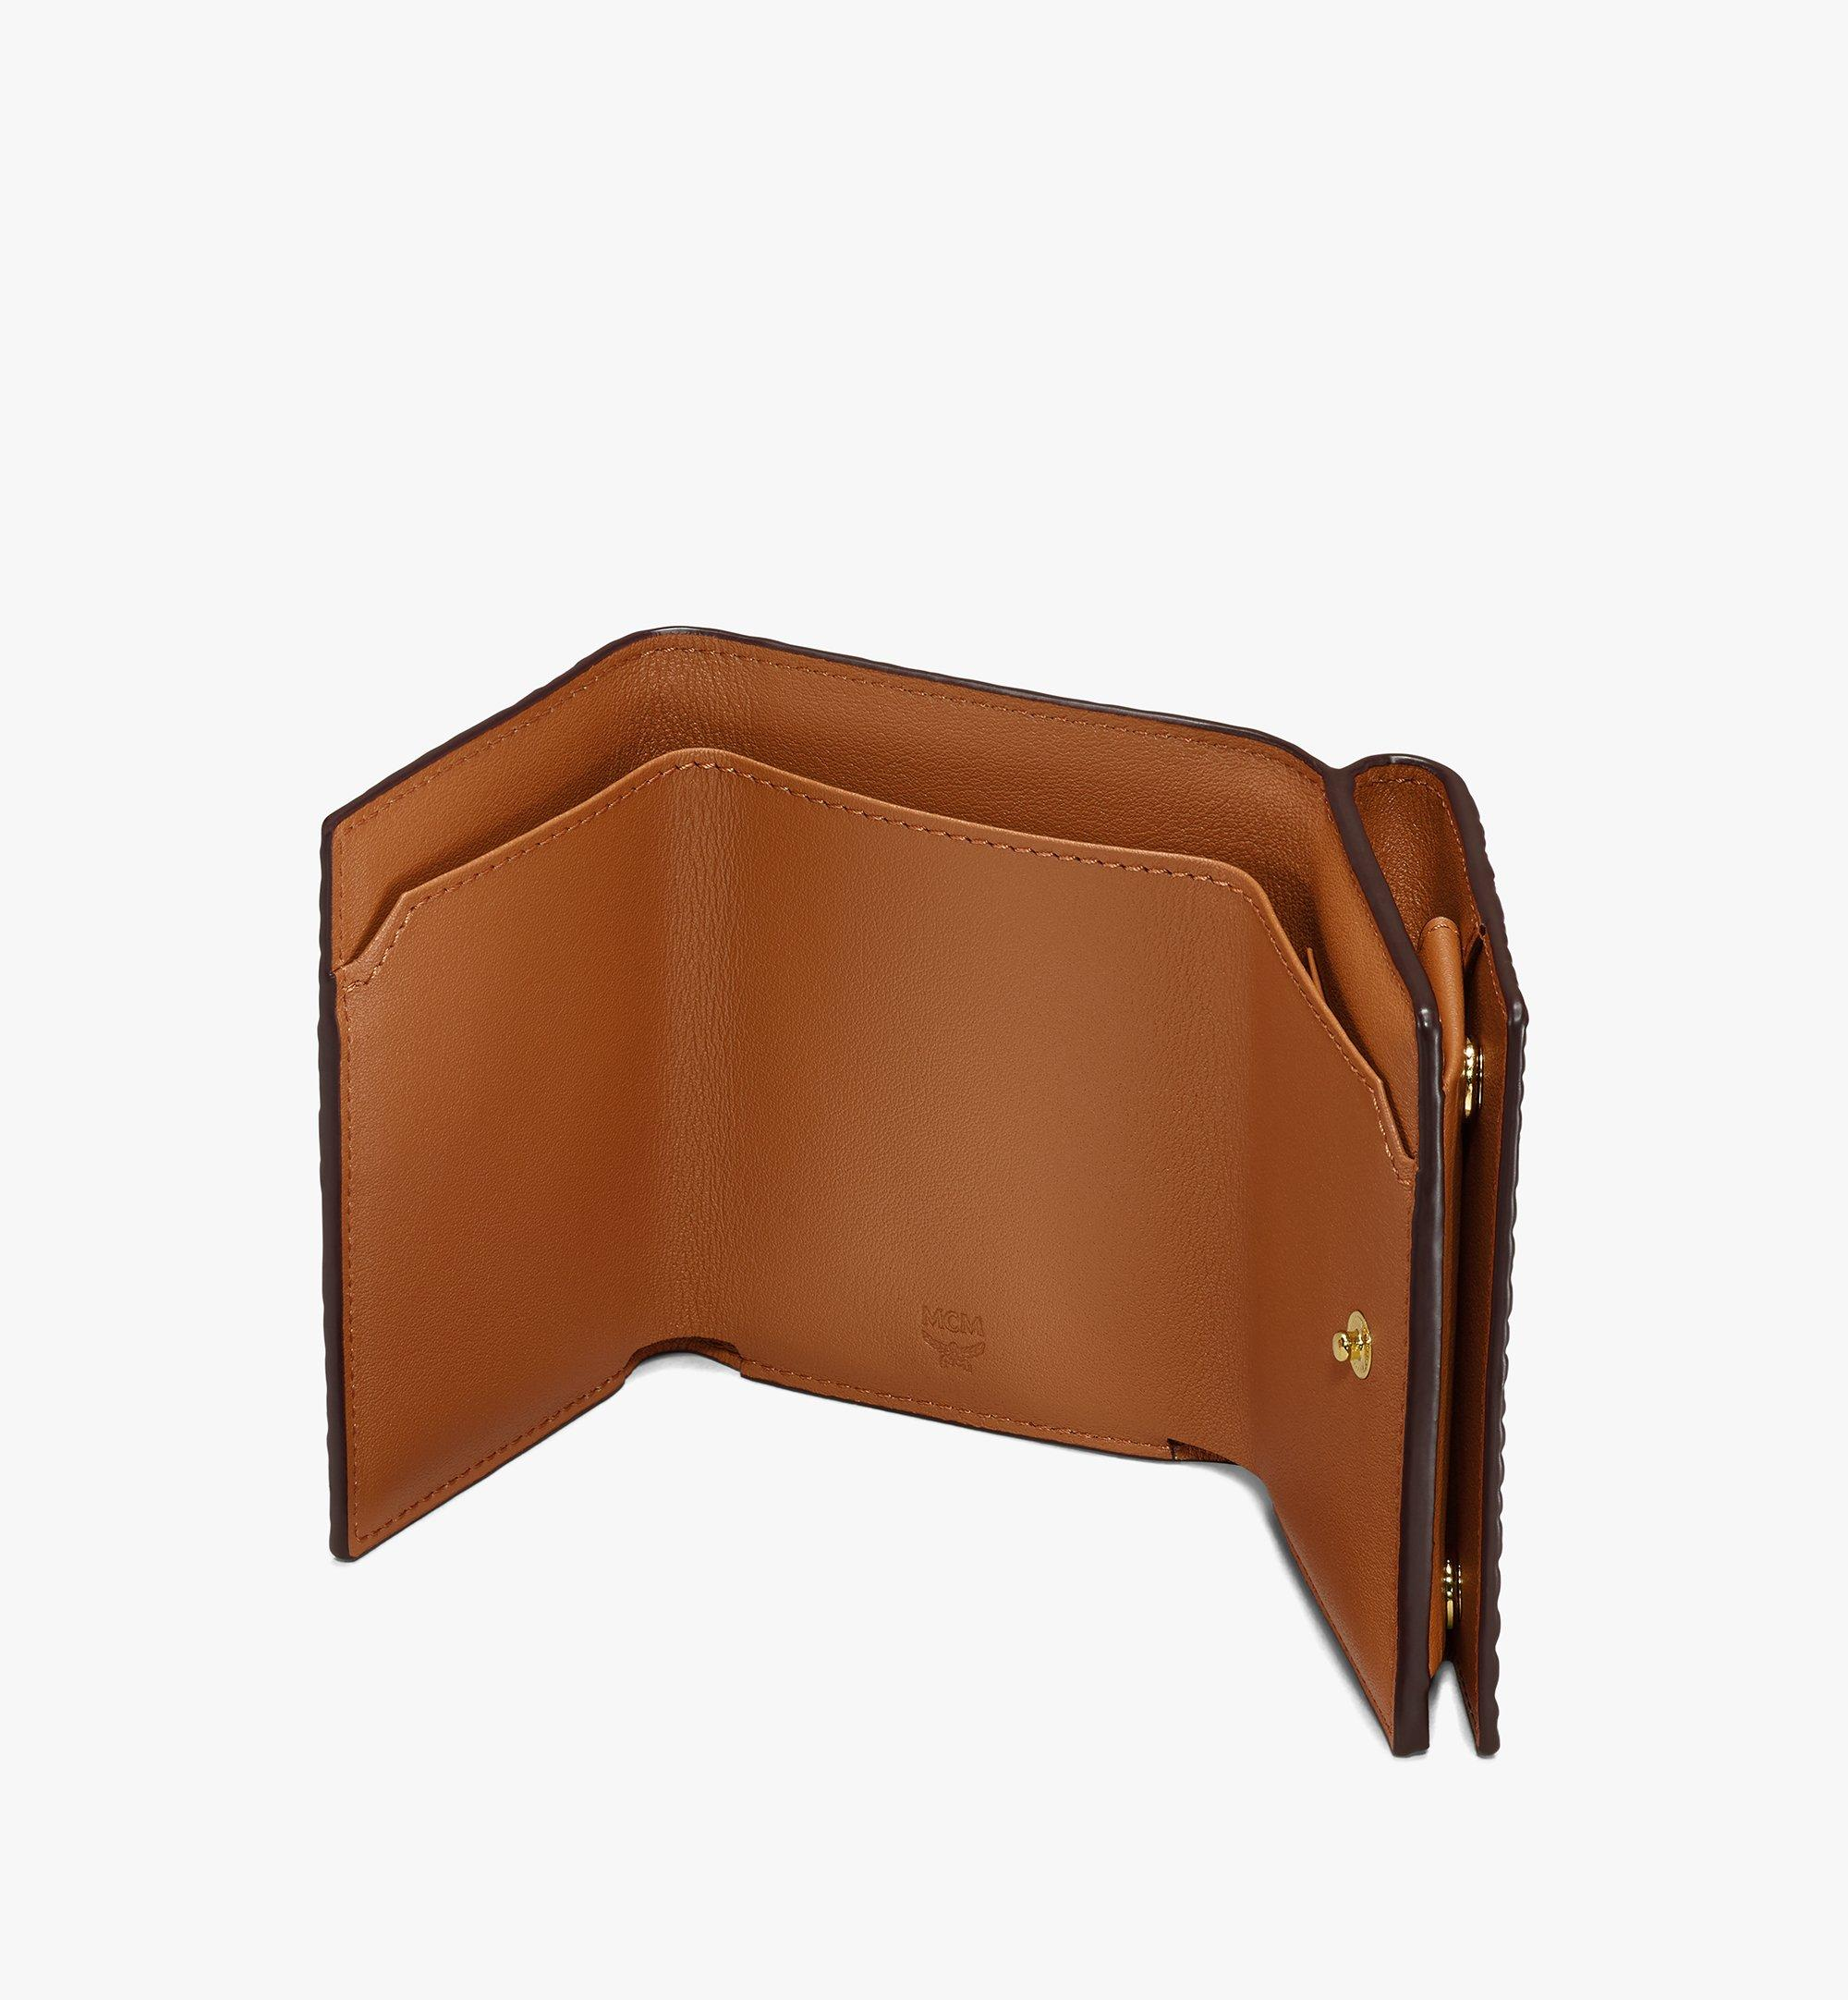 MCM กระเป๋าสตางค์พับสามทบลาย Visetos Cognac MYAASVI01CO001 มุมมองอื่น 2